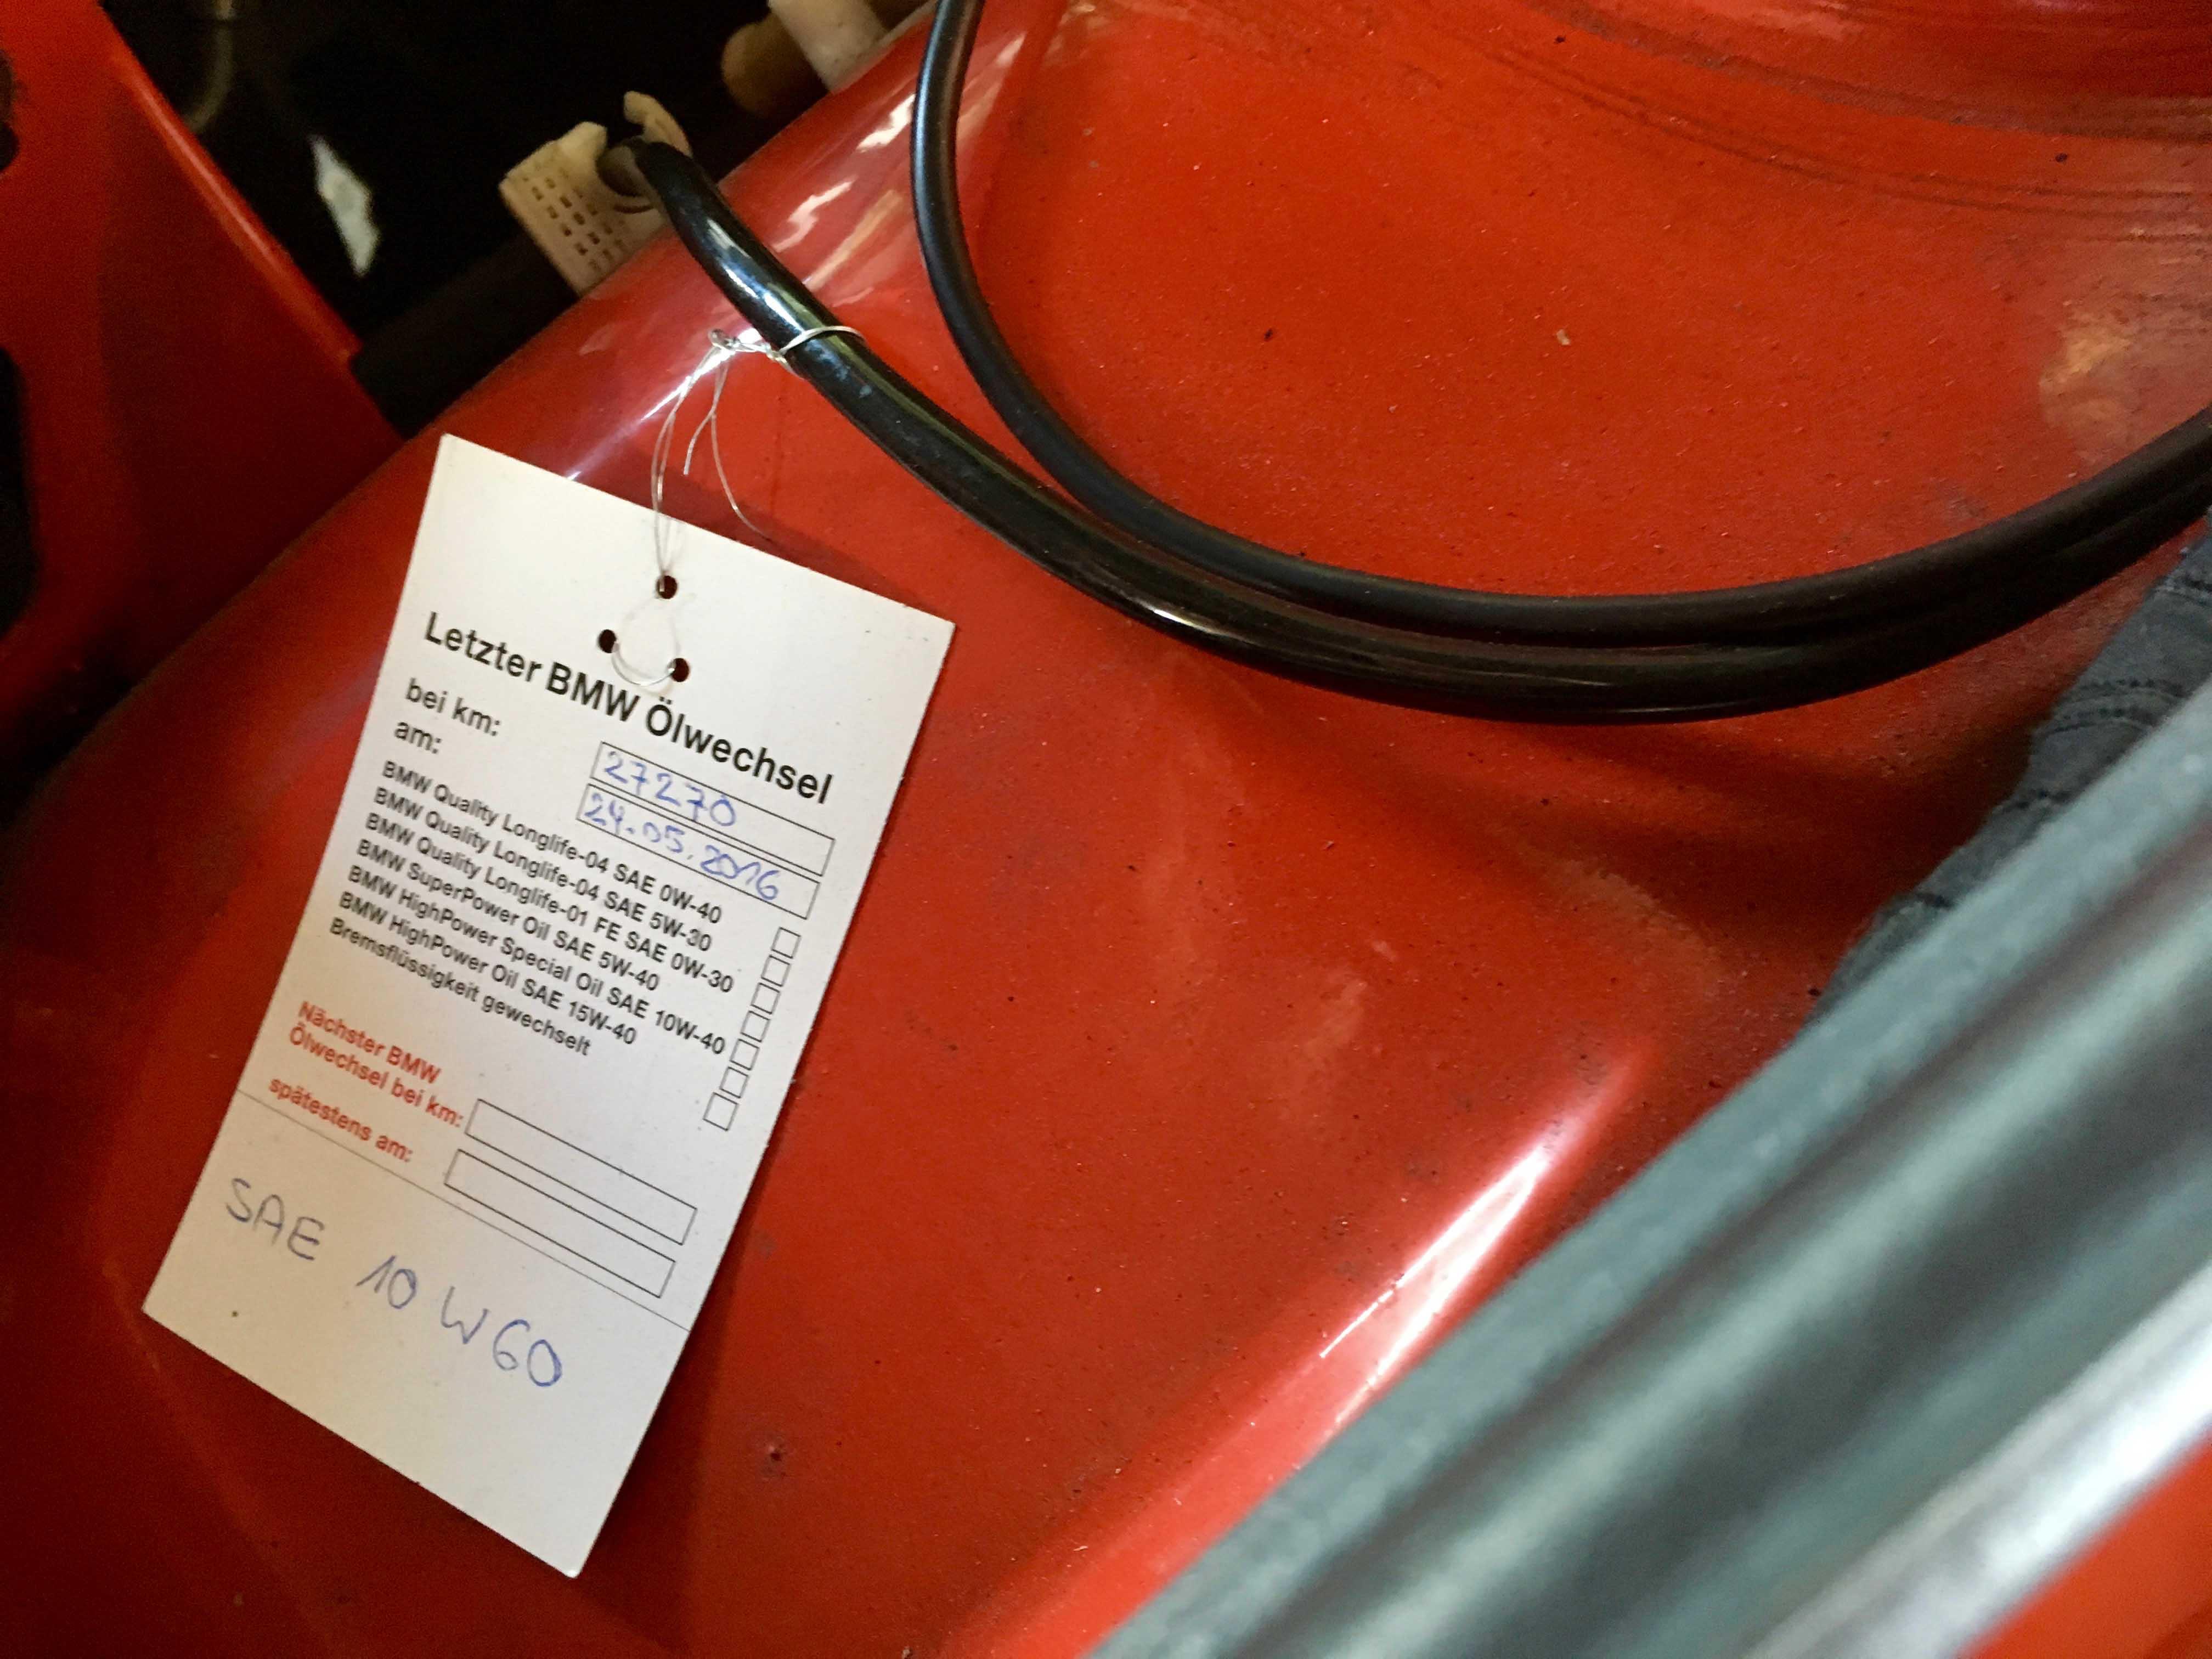 1987 BMW M3 Factory engine tag